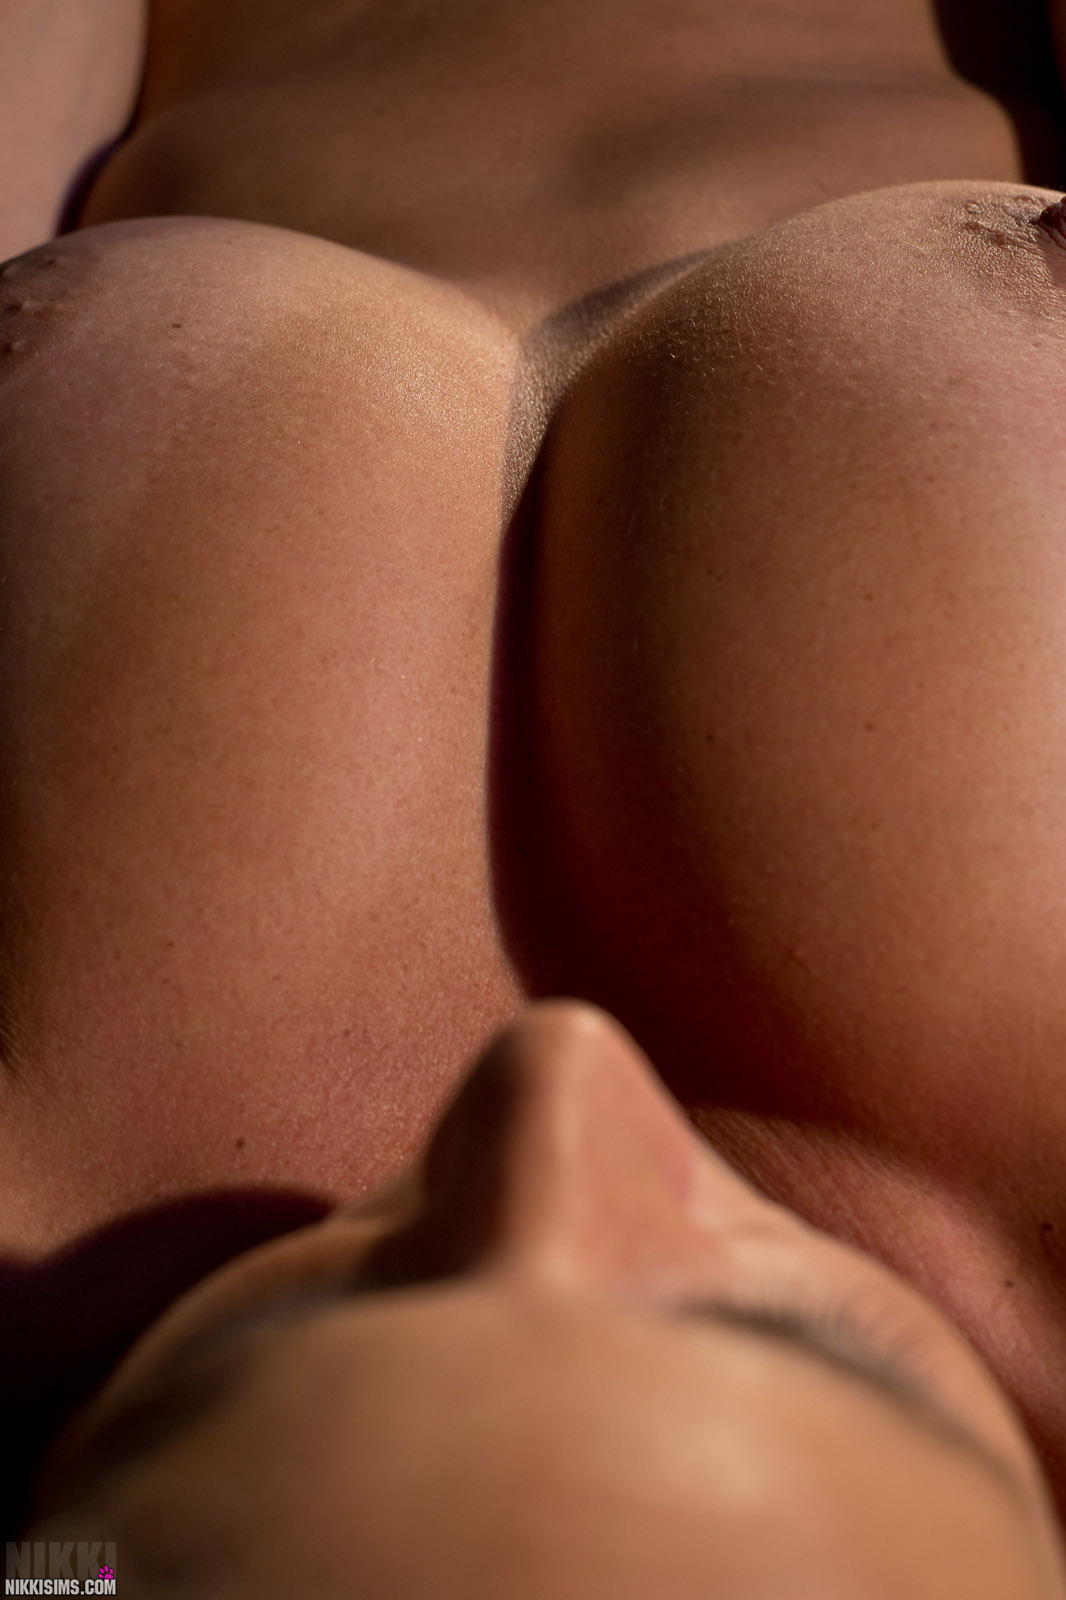 Nikki Sims Topless No Panties Trimmed Pubes